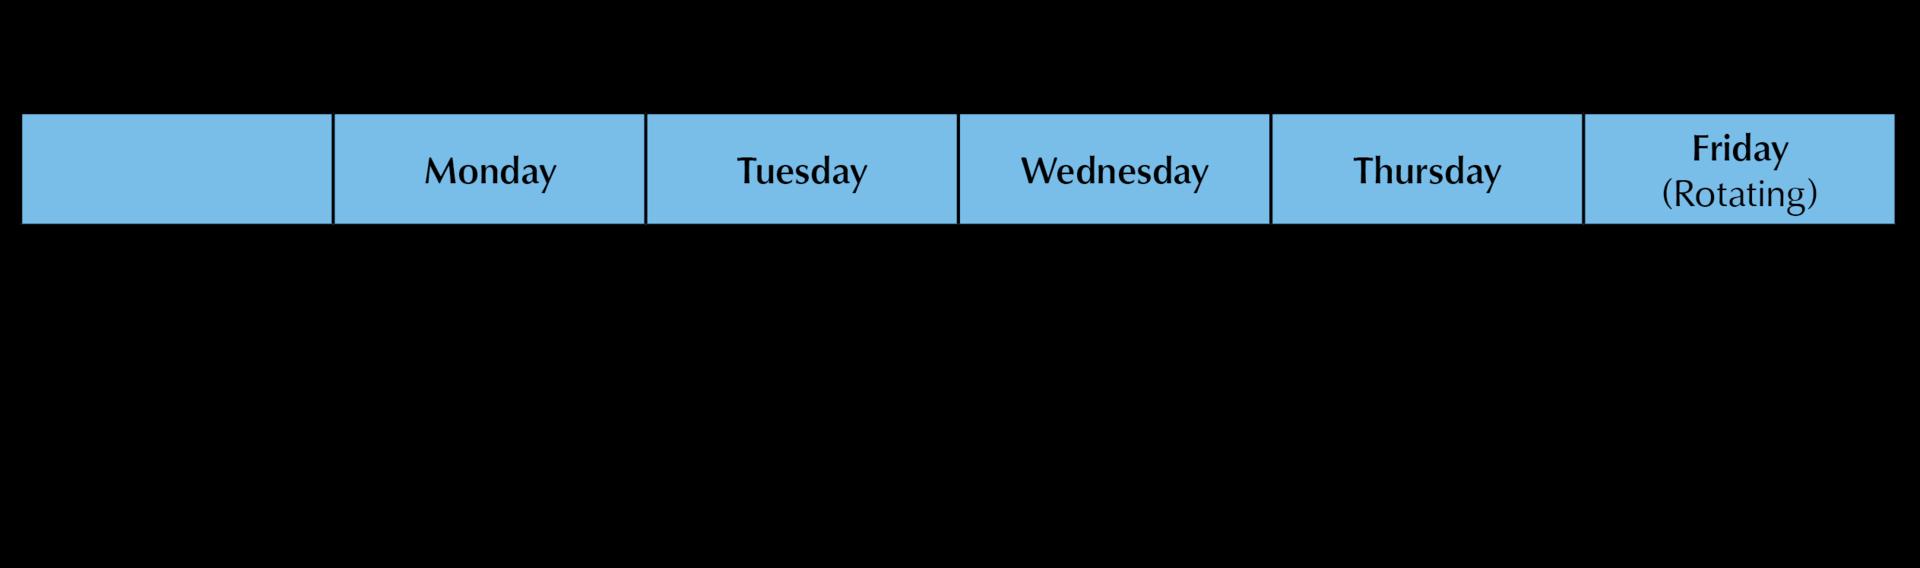 Sample ICA Cristo Rey Work Study Job Schedule 2019-2020